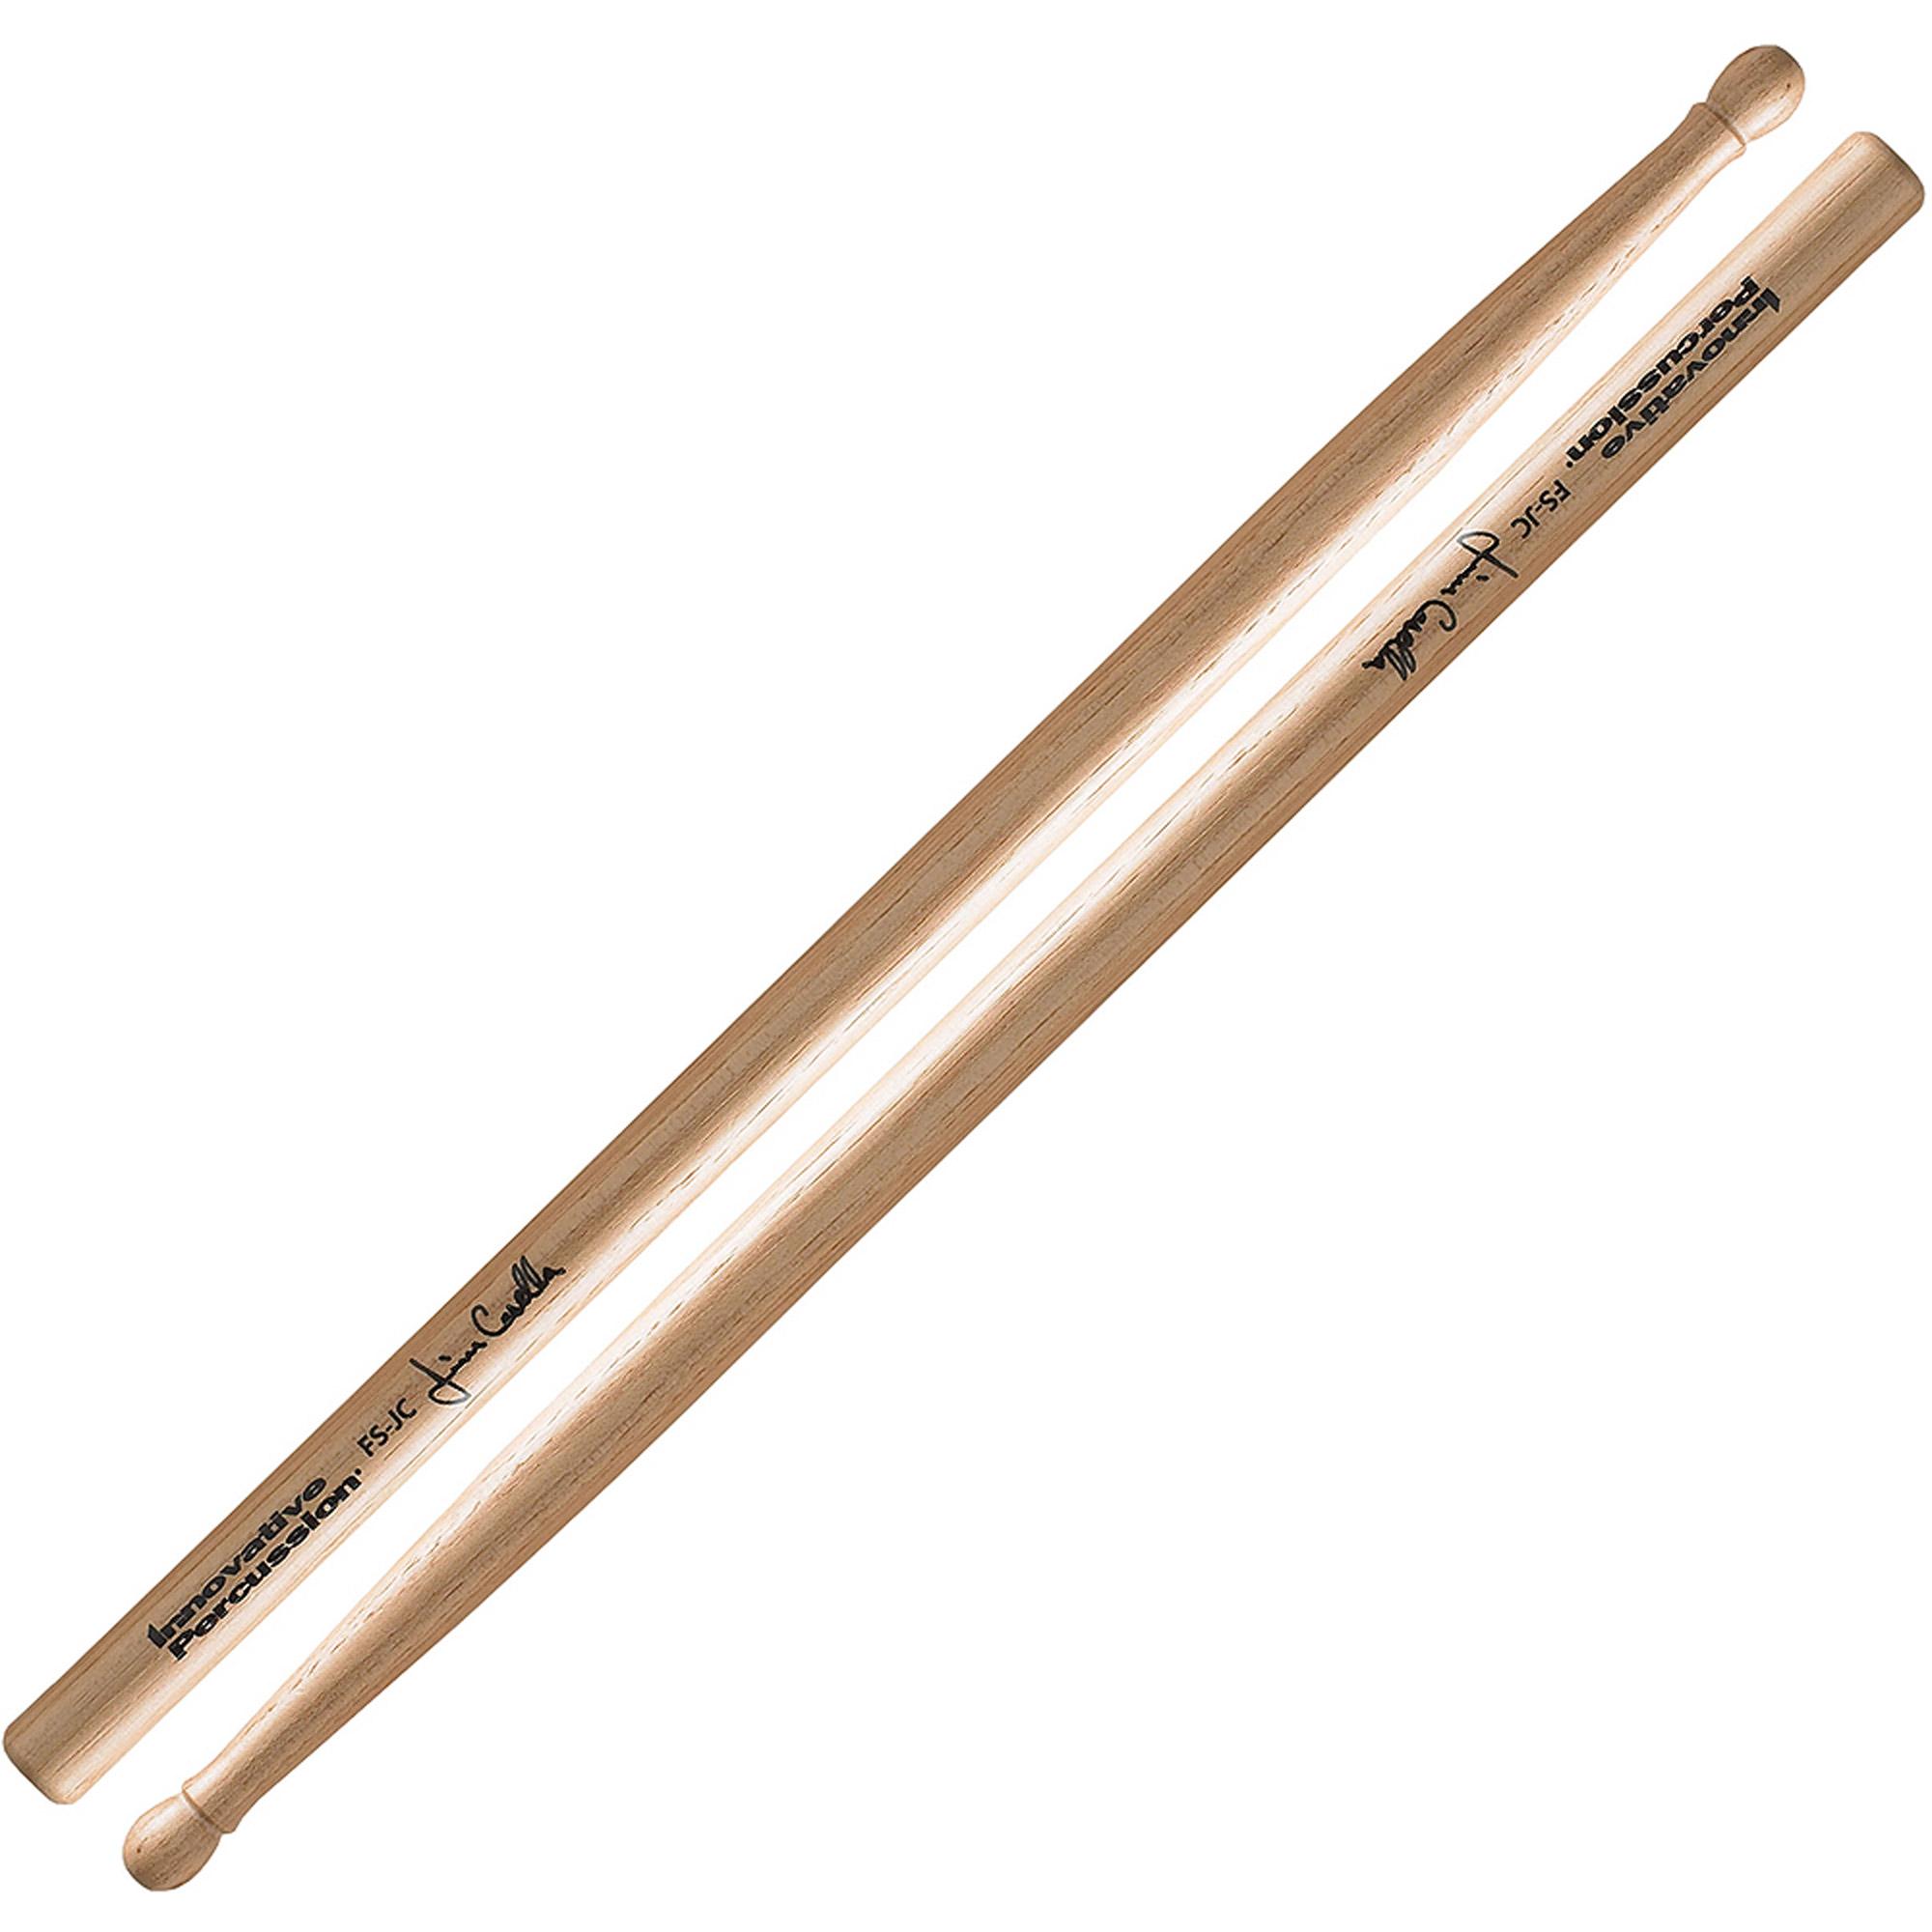 Innovative Percussion FSJC Marching Snare Field Series Jim Casella Signature Drumsticks